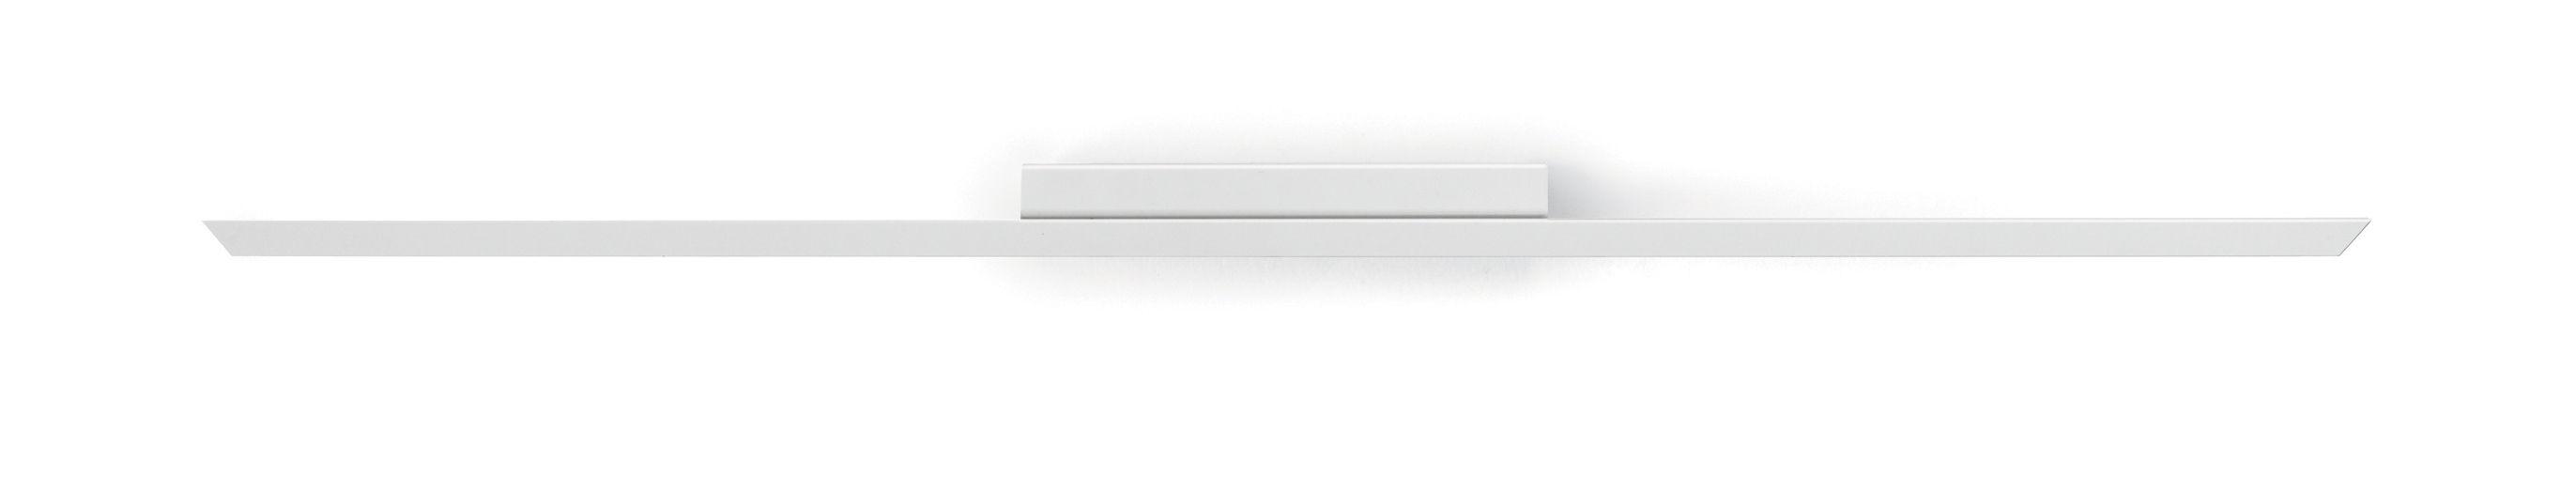 Lighting - Ceiling Lights - Lineal LED Wall light - / L 86 cm by Carpyen - L 86 cm / White - Lacquered aluminium